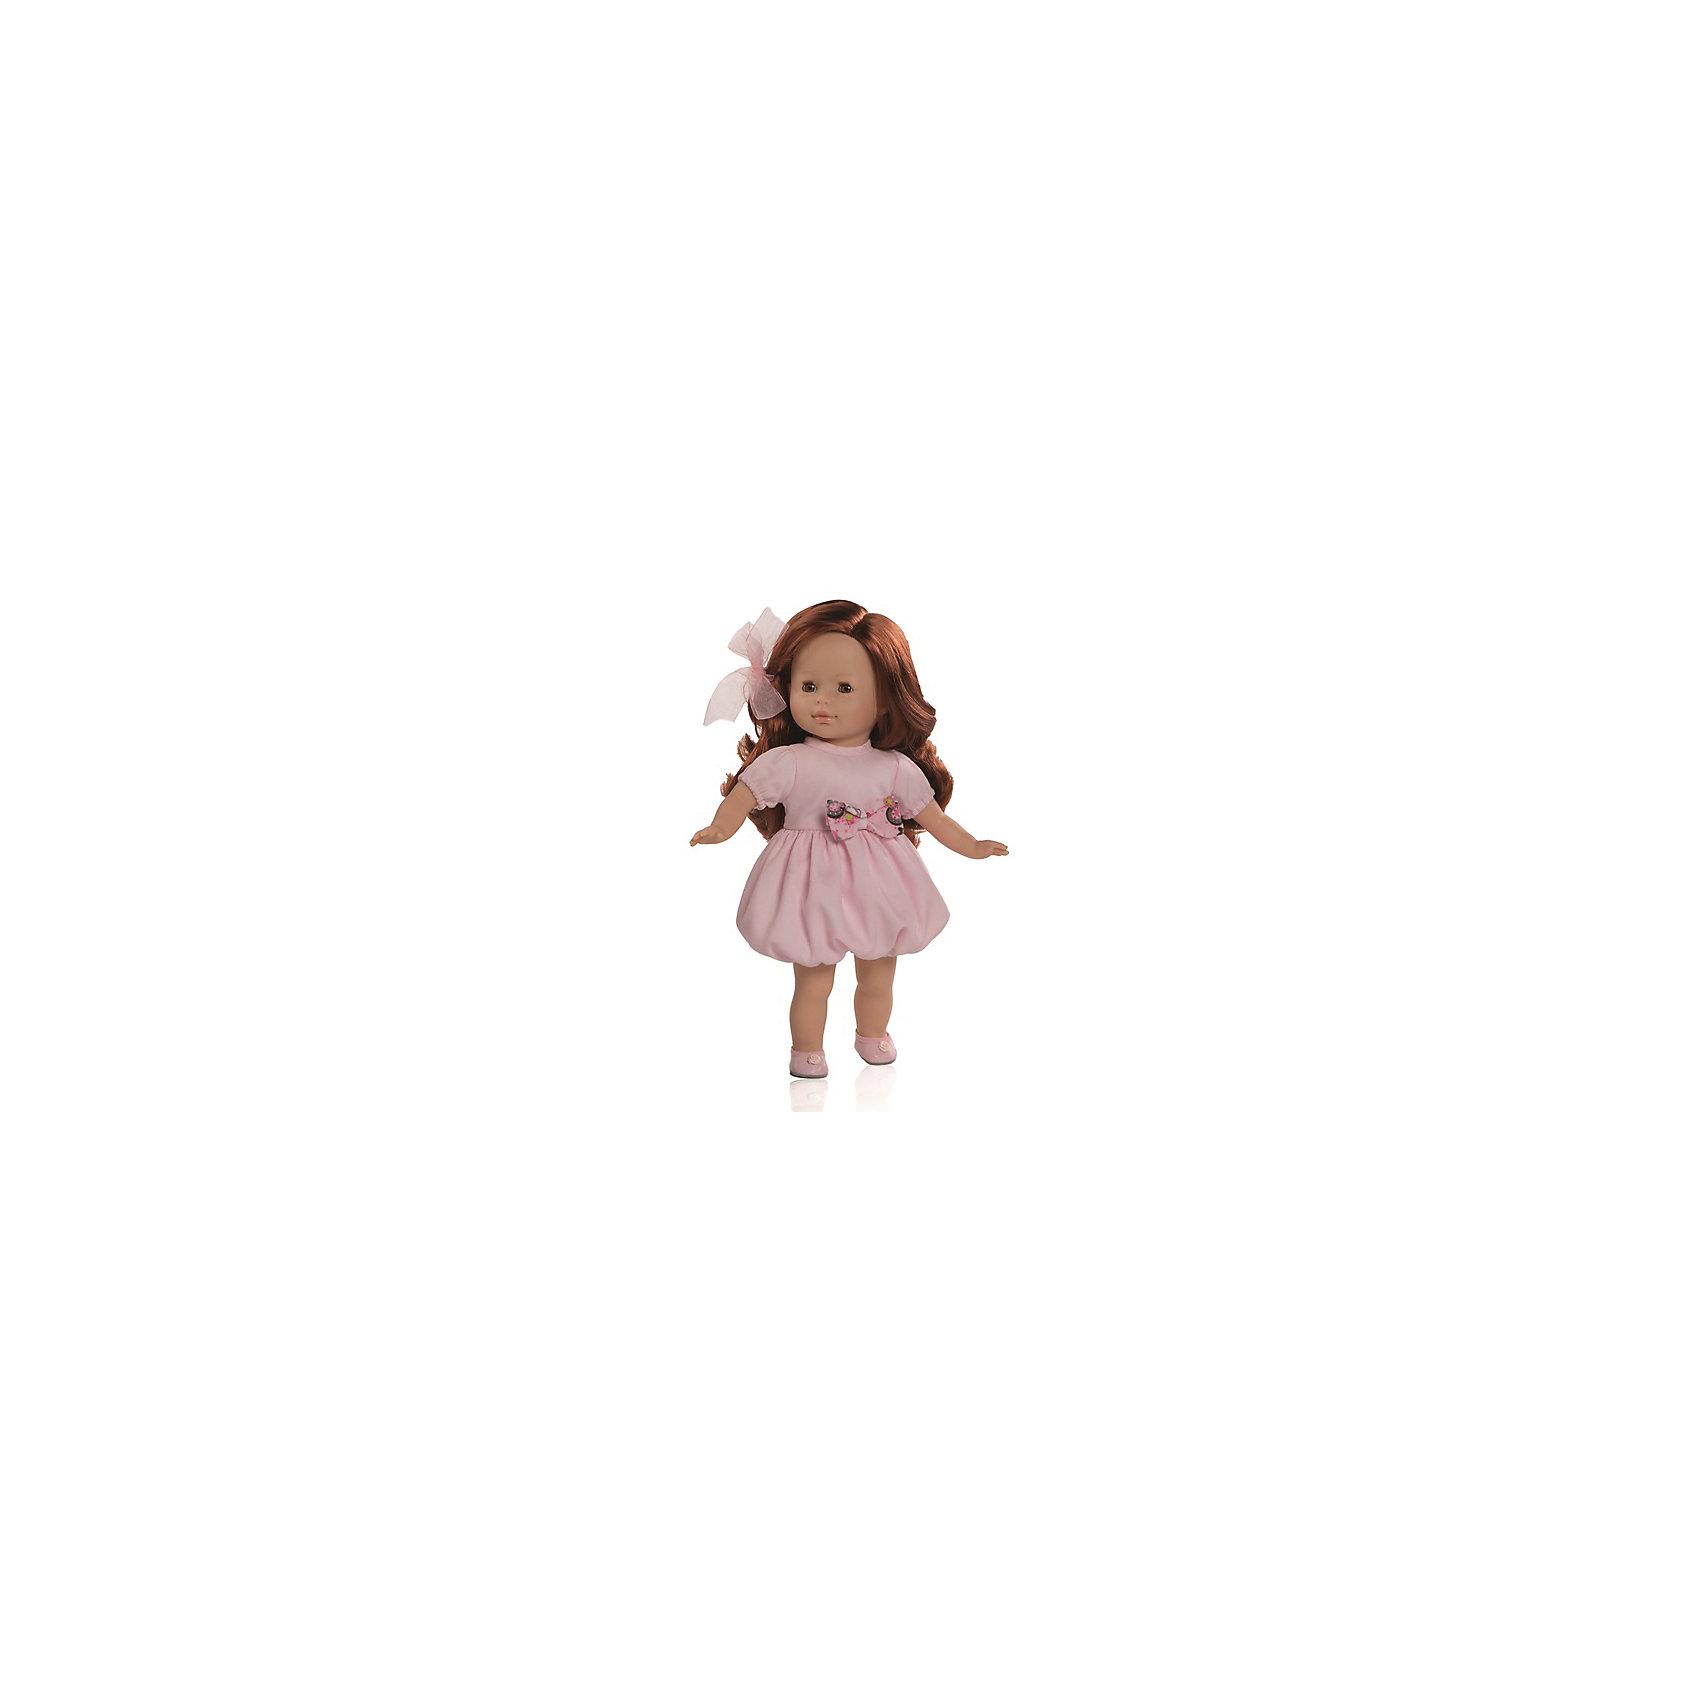 Paola Reina Кукла Анна, 36 см, Paola Reina paola reina пупс без одежды 22 см 31019